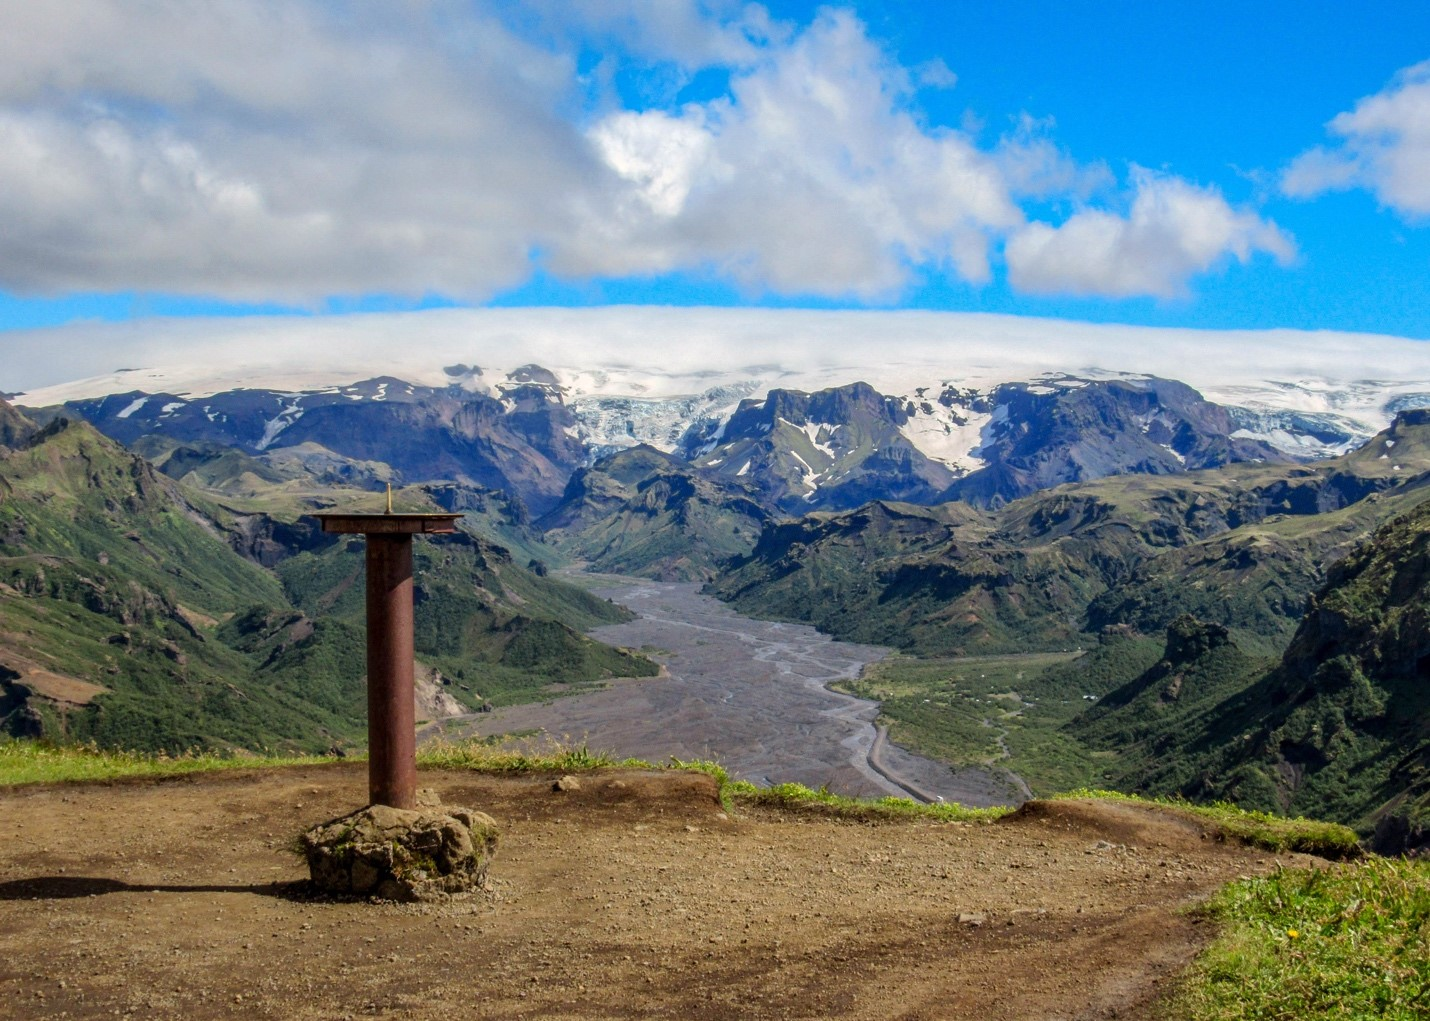 Glaciers on Iceland: Mýrdalsjökull Glacier Iceland